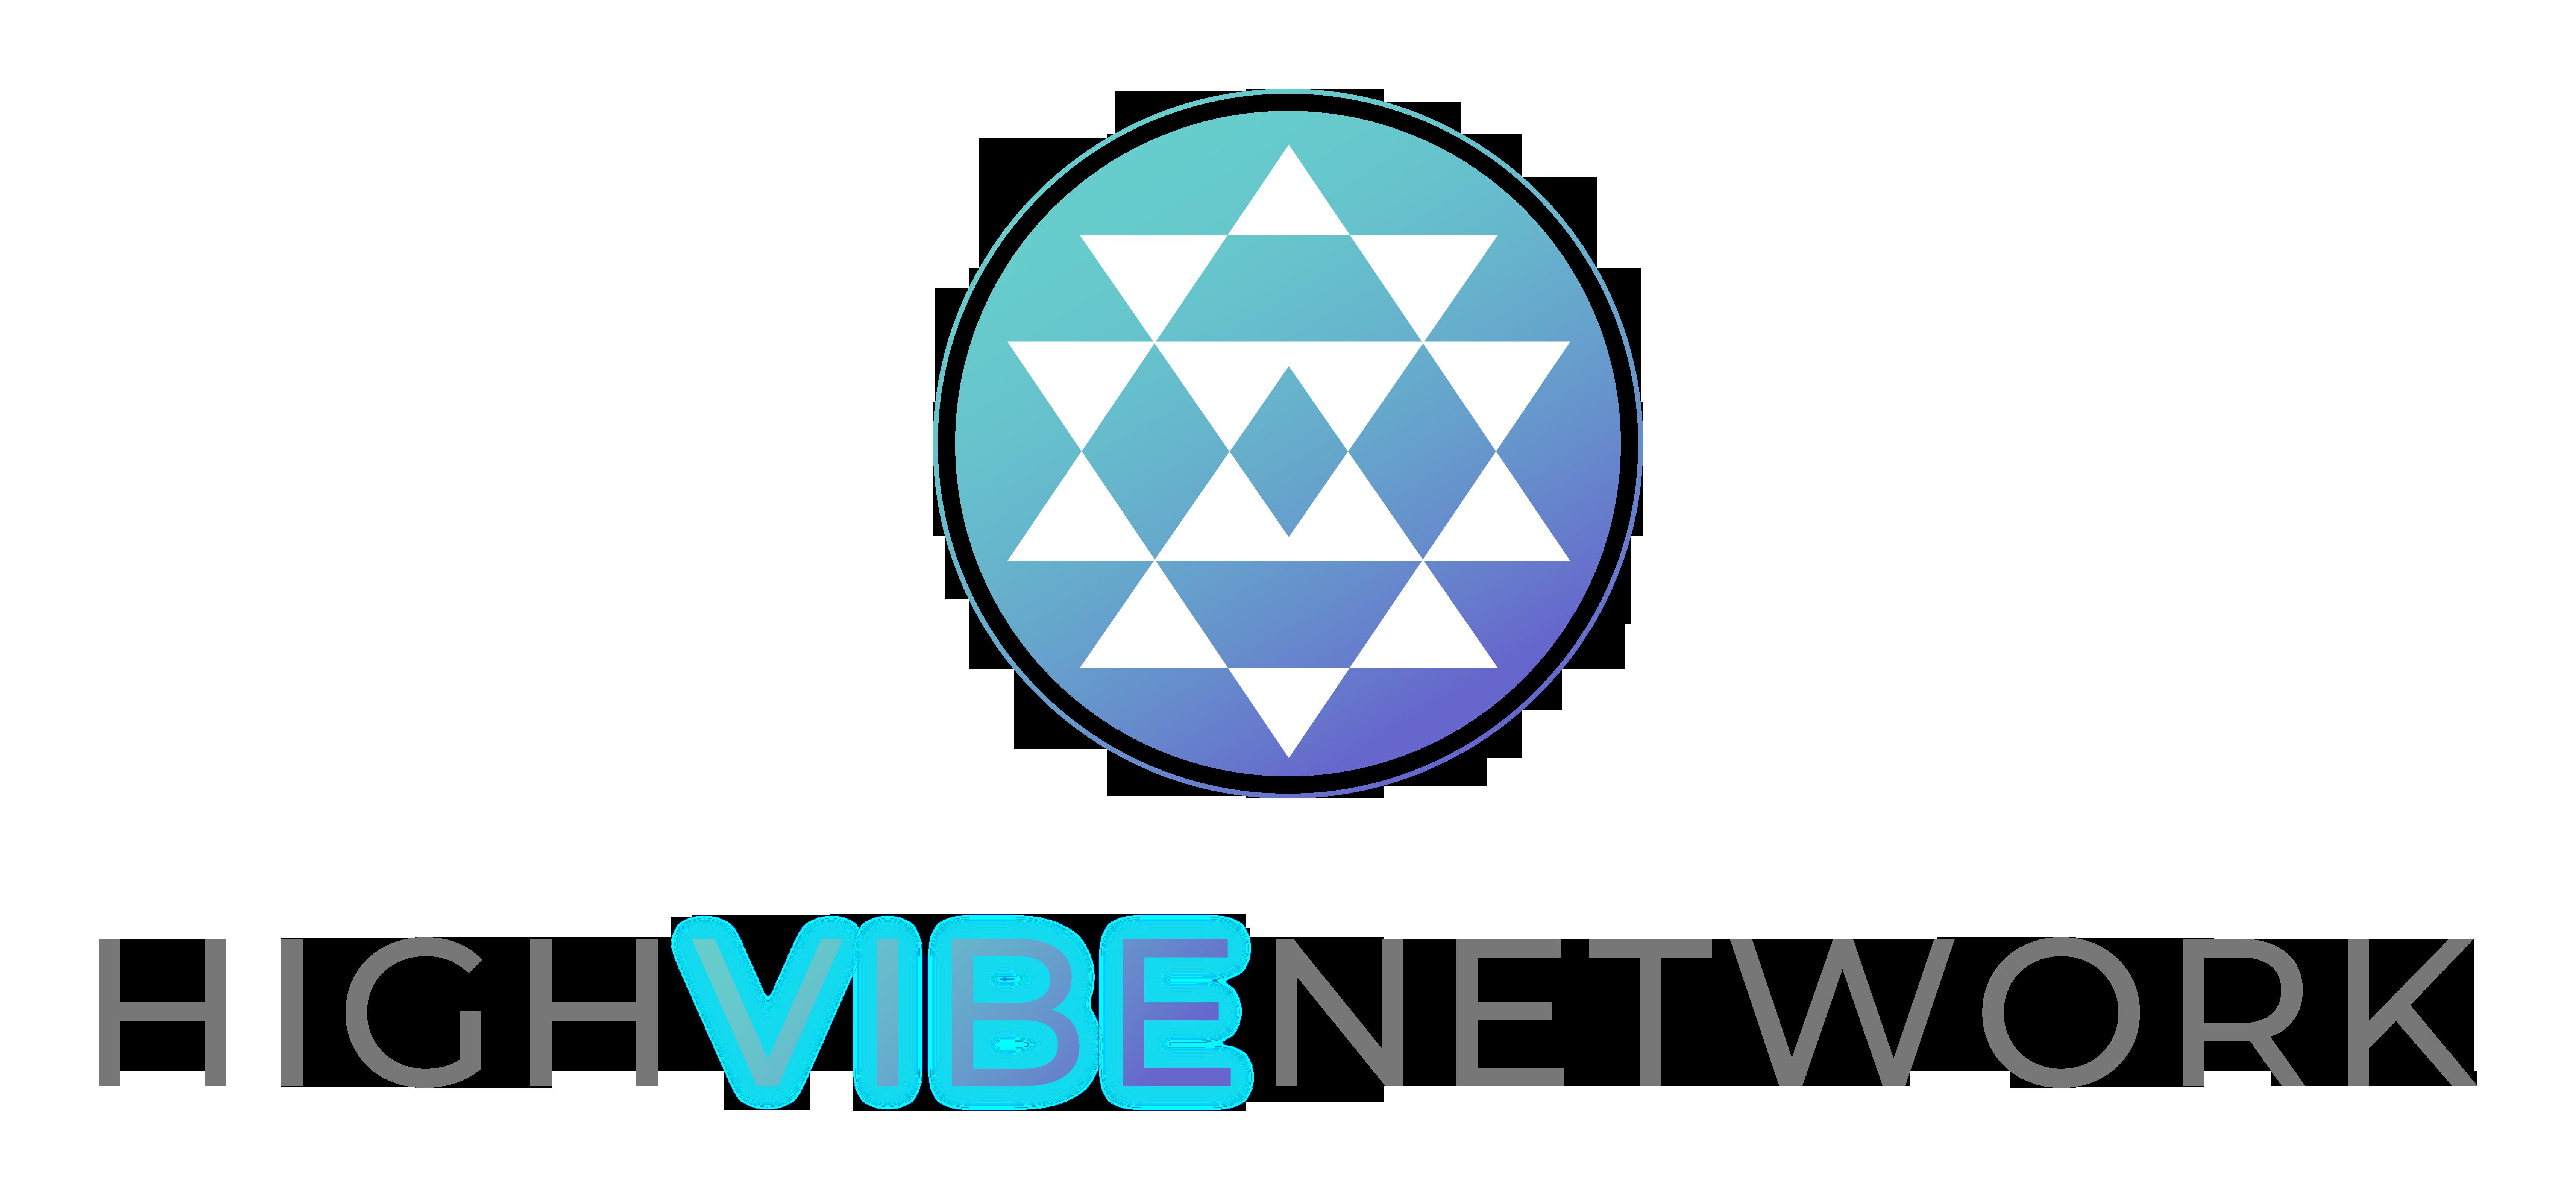 High Vibe Network